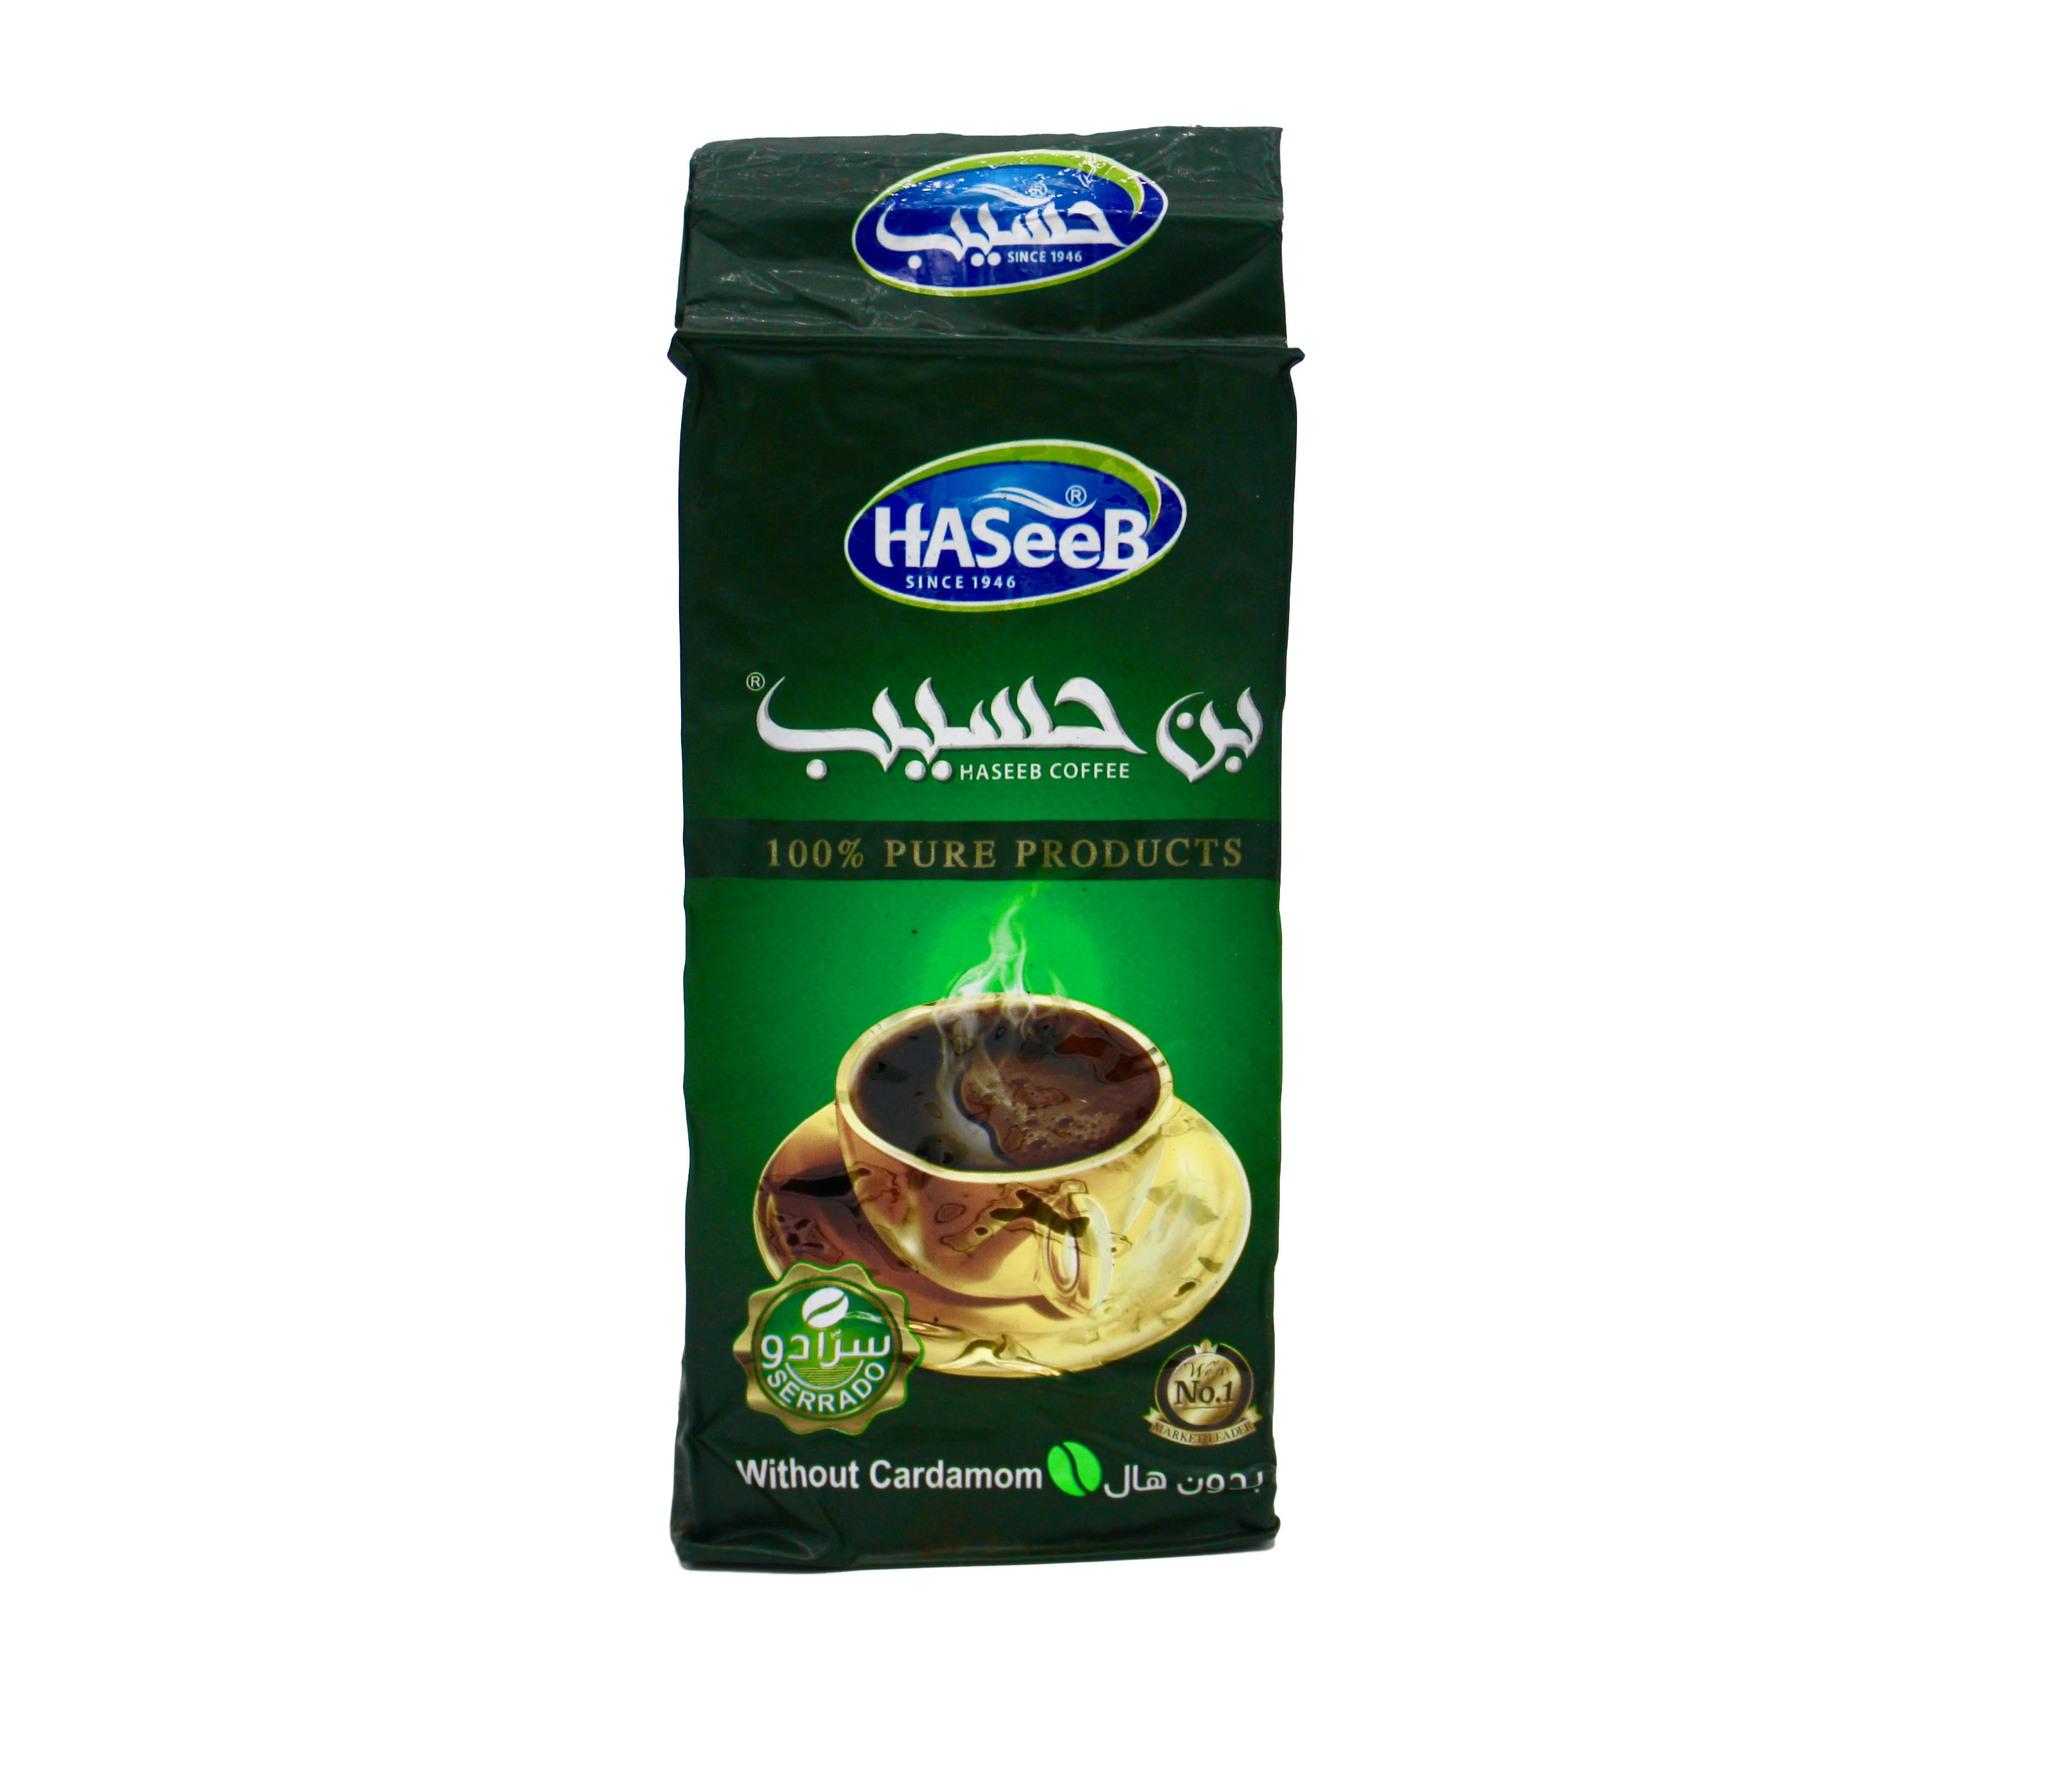 Кофе молотый Арабский кофе натуральный молотый, Haseeb, 200 г import_files_ac_acda60ae5f4f11e8868b448a5b3752ae_0d3c61995e8511e8a996484d7ecee297.jpg